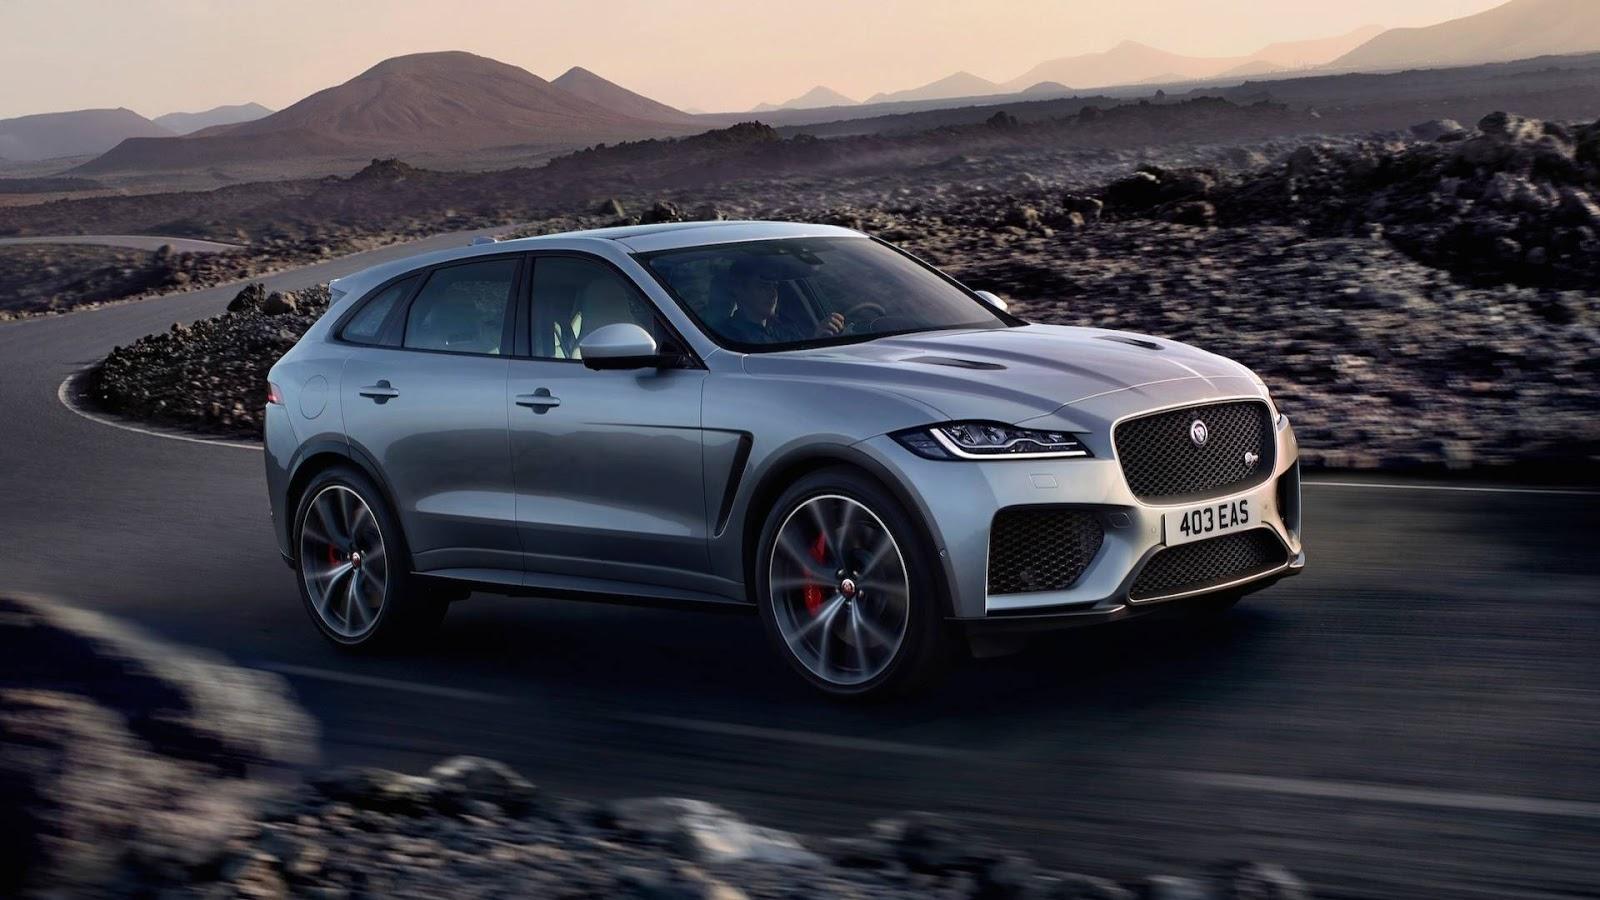 2020 Jaguar F Pace Review.Carshighlight Com Cars Review Concept Specs Price 2020